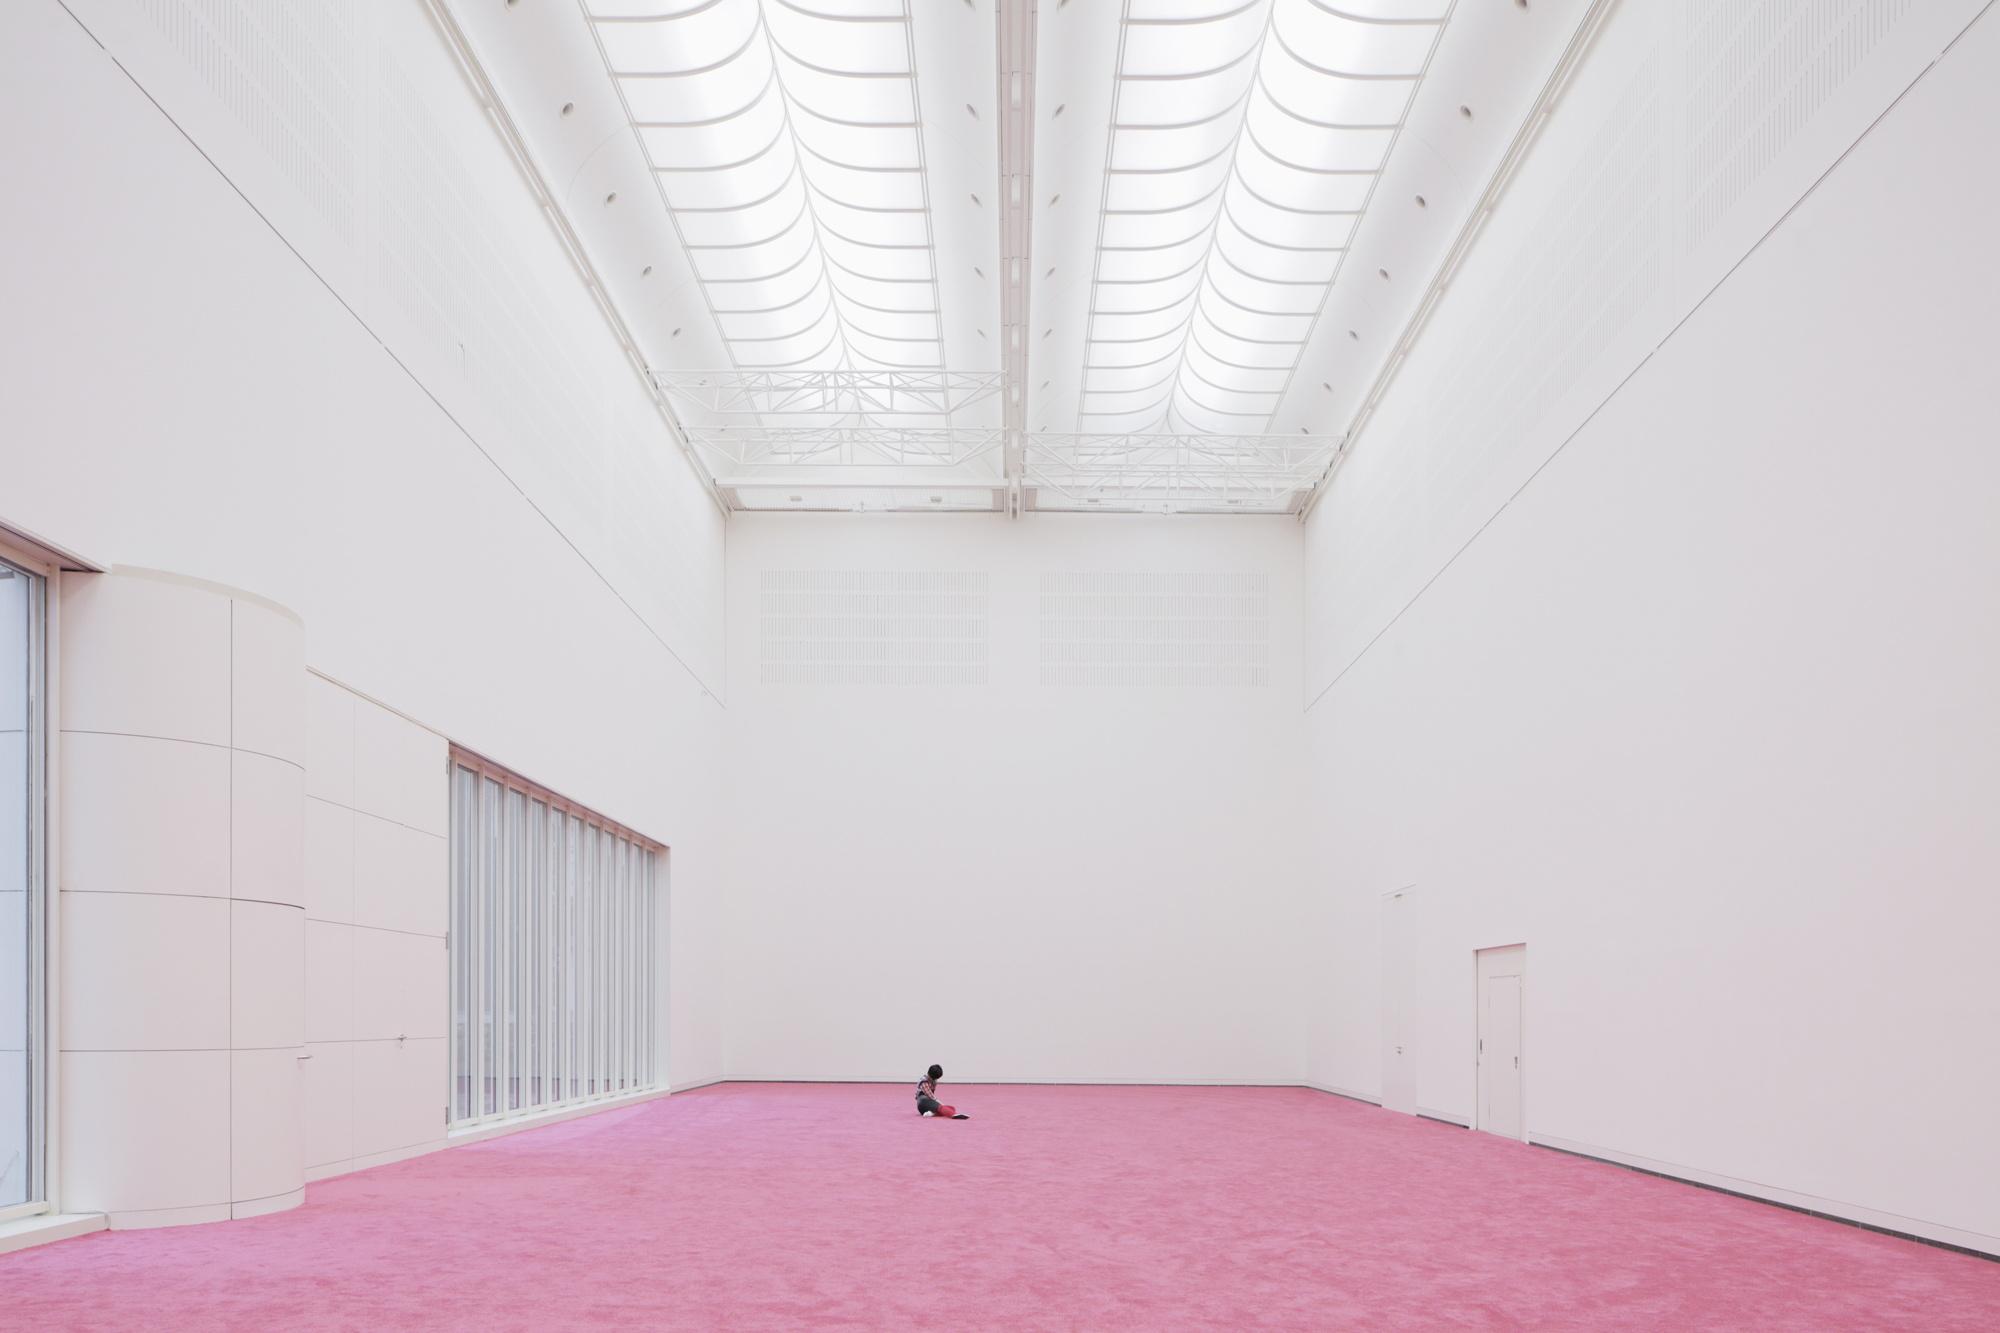 maria hassabi at kunstsammlung nordrhein westfalen art. Black Bedroom Furniture Sets. Home Design Ideas